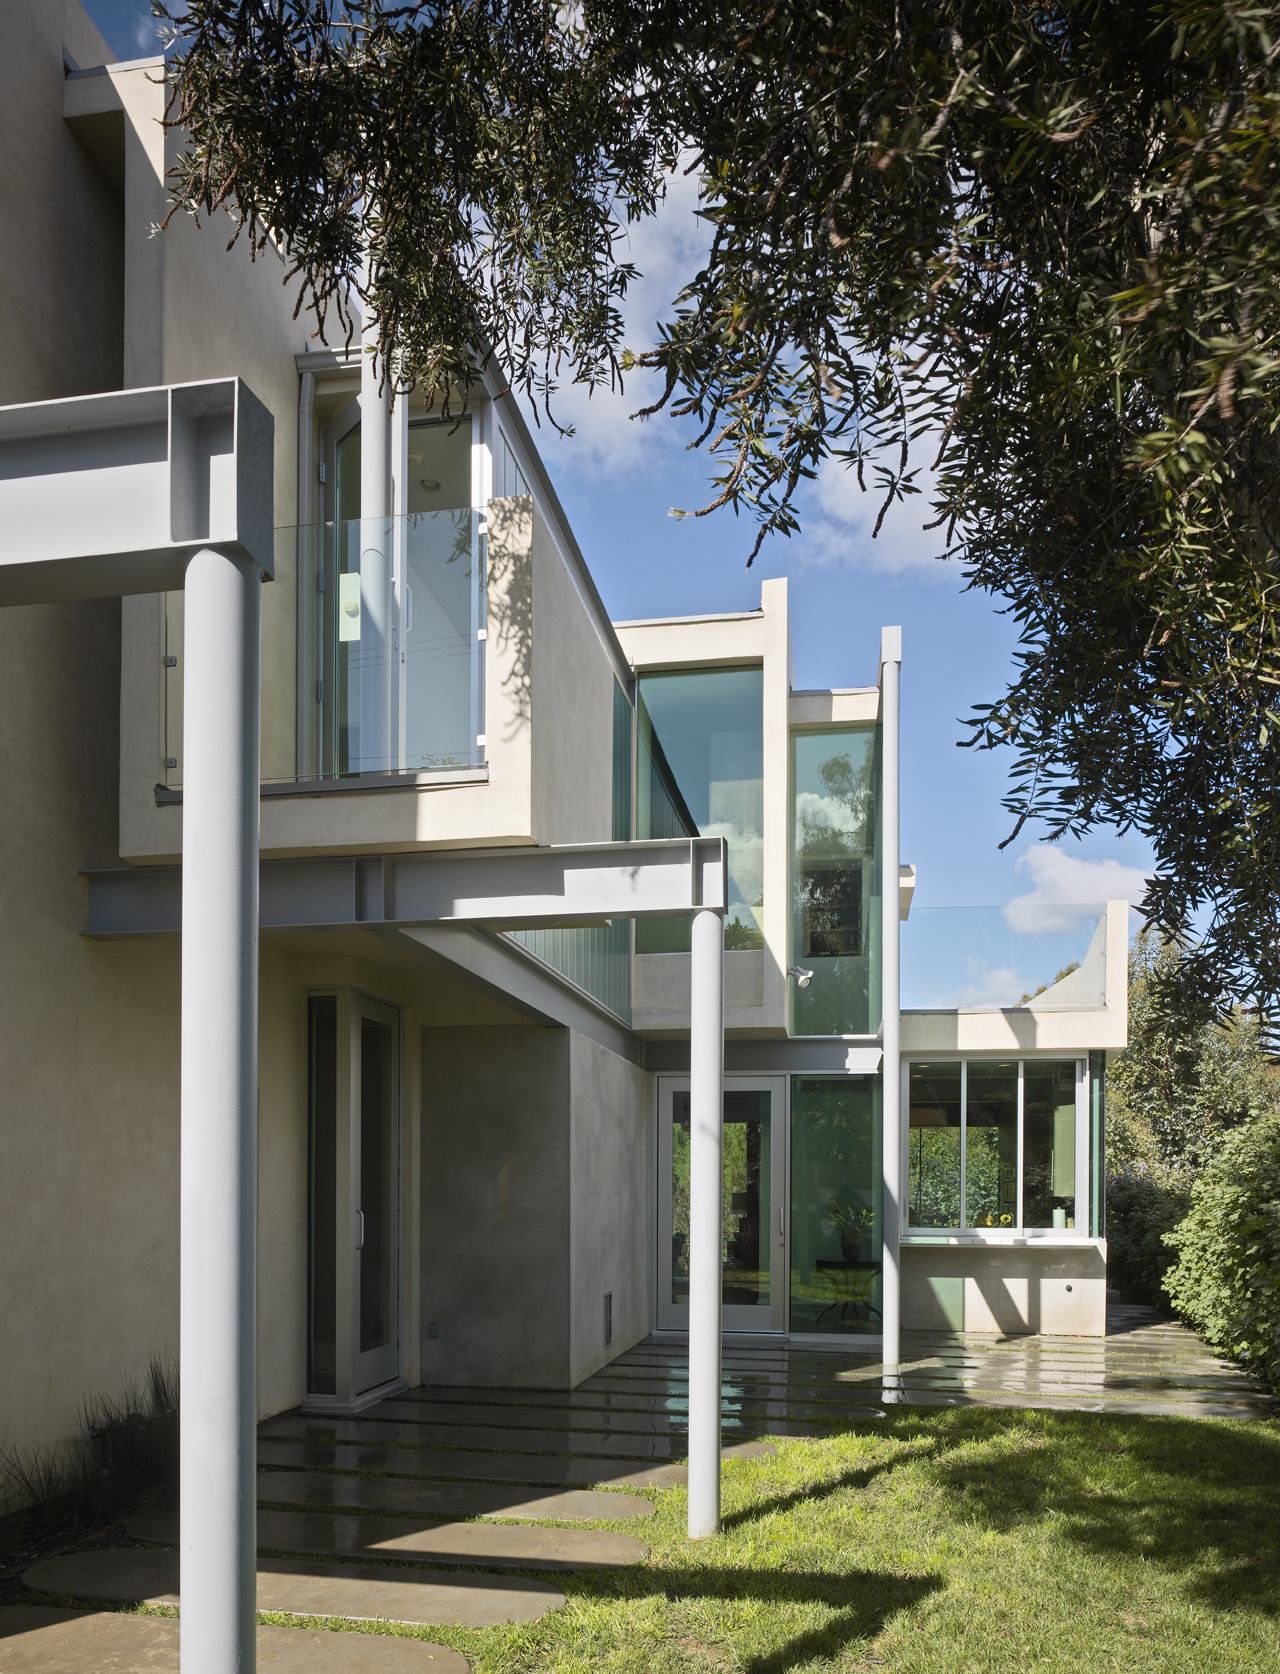 Pacific Palisades Residence / Warren Techentin Architecture, © Eric Staudenmaier